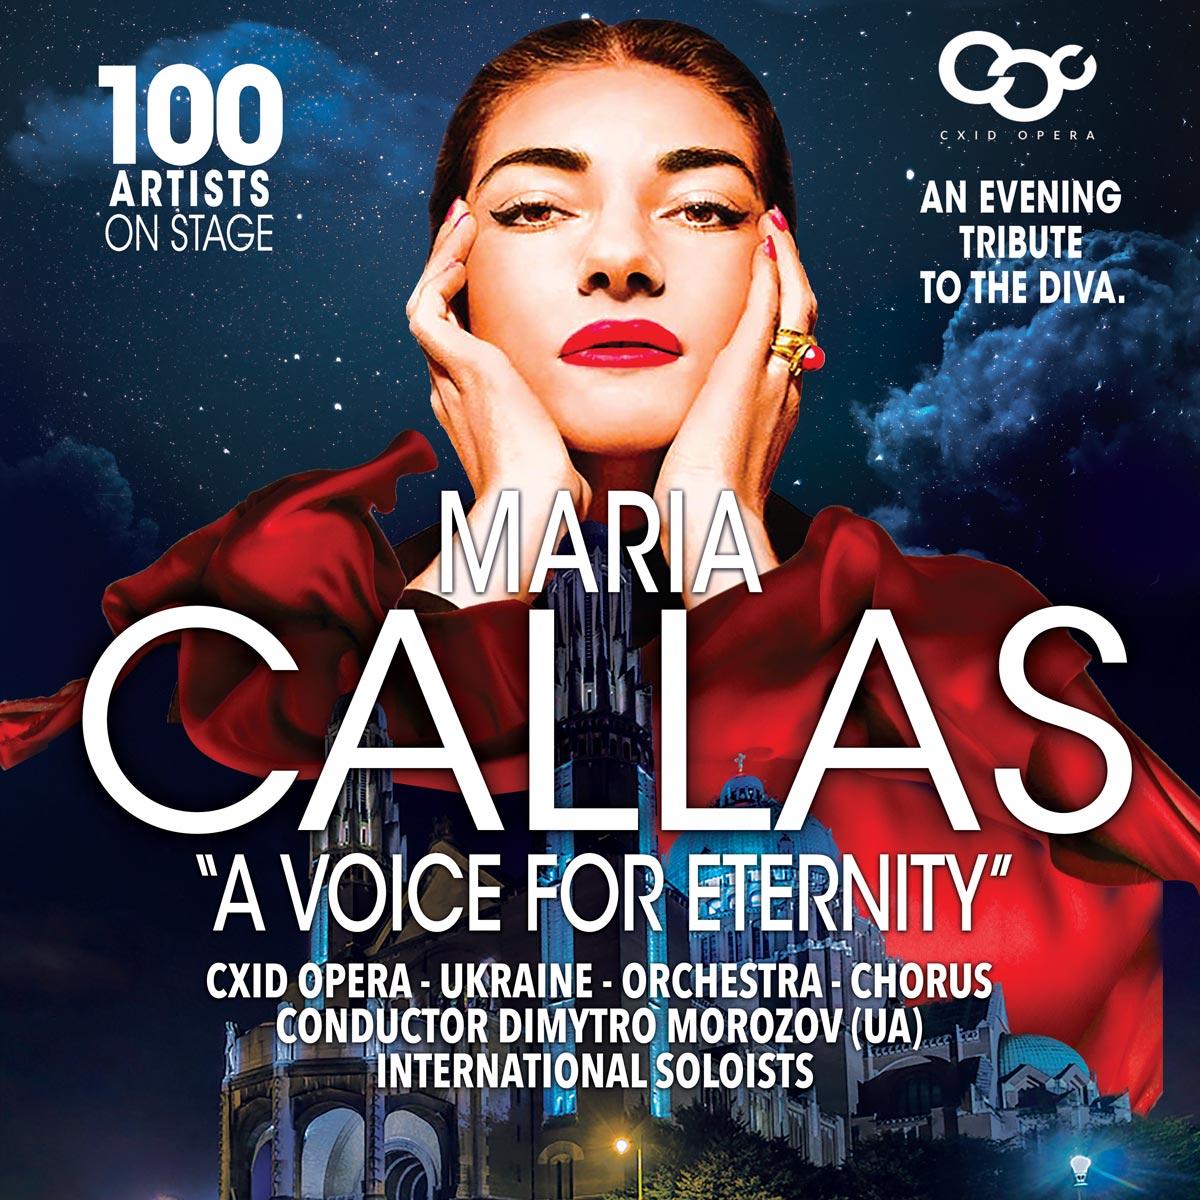 Maria Callas, a voice for eternity, basilic of Koekelberg